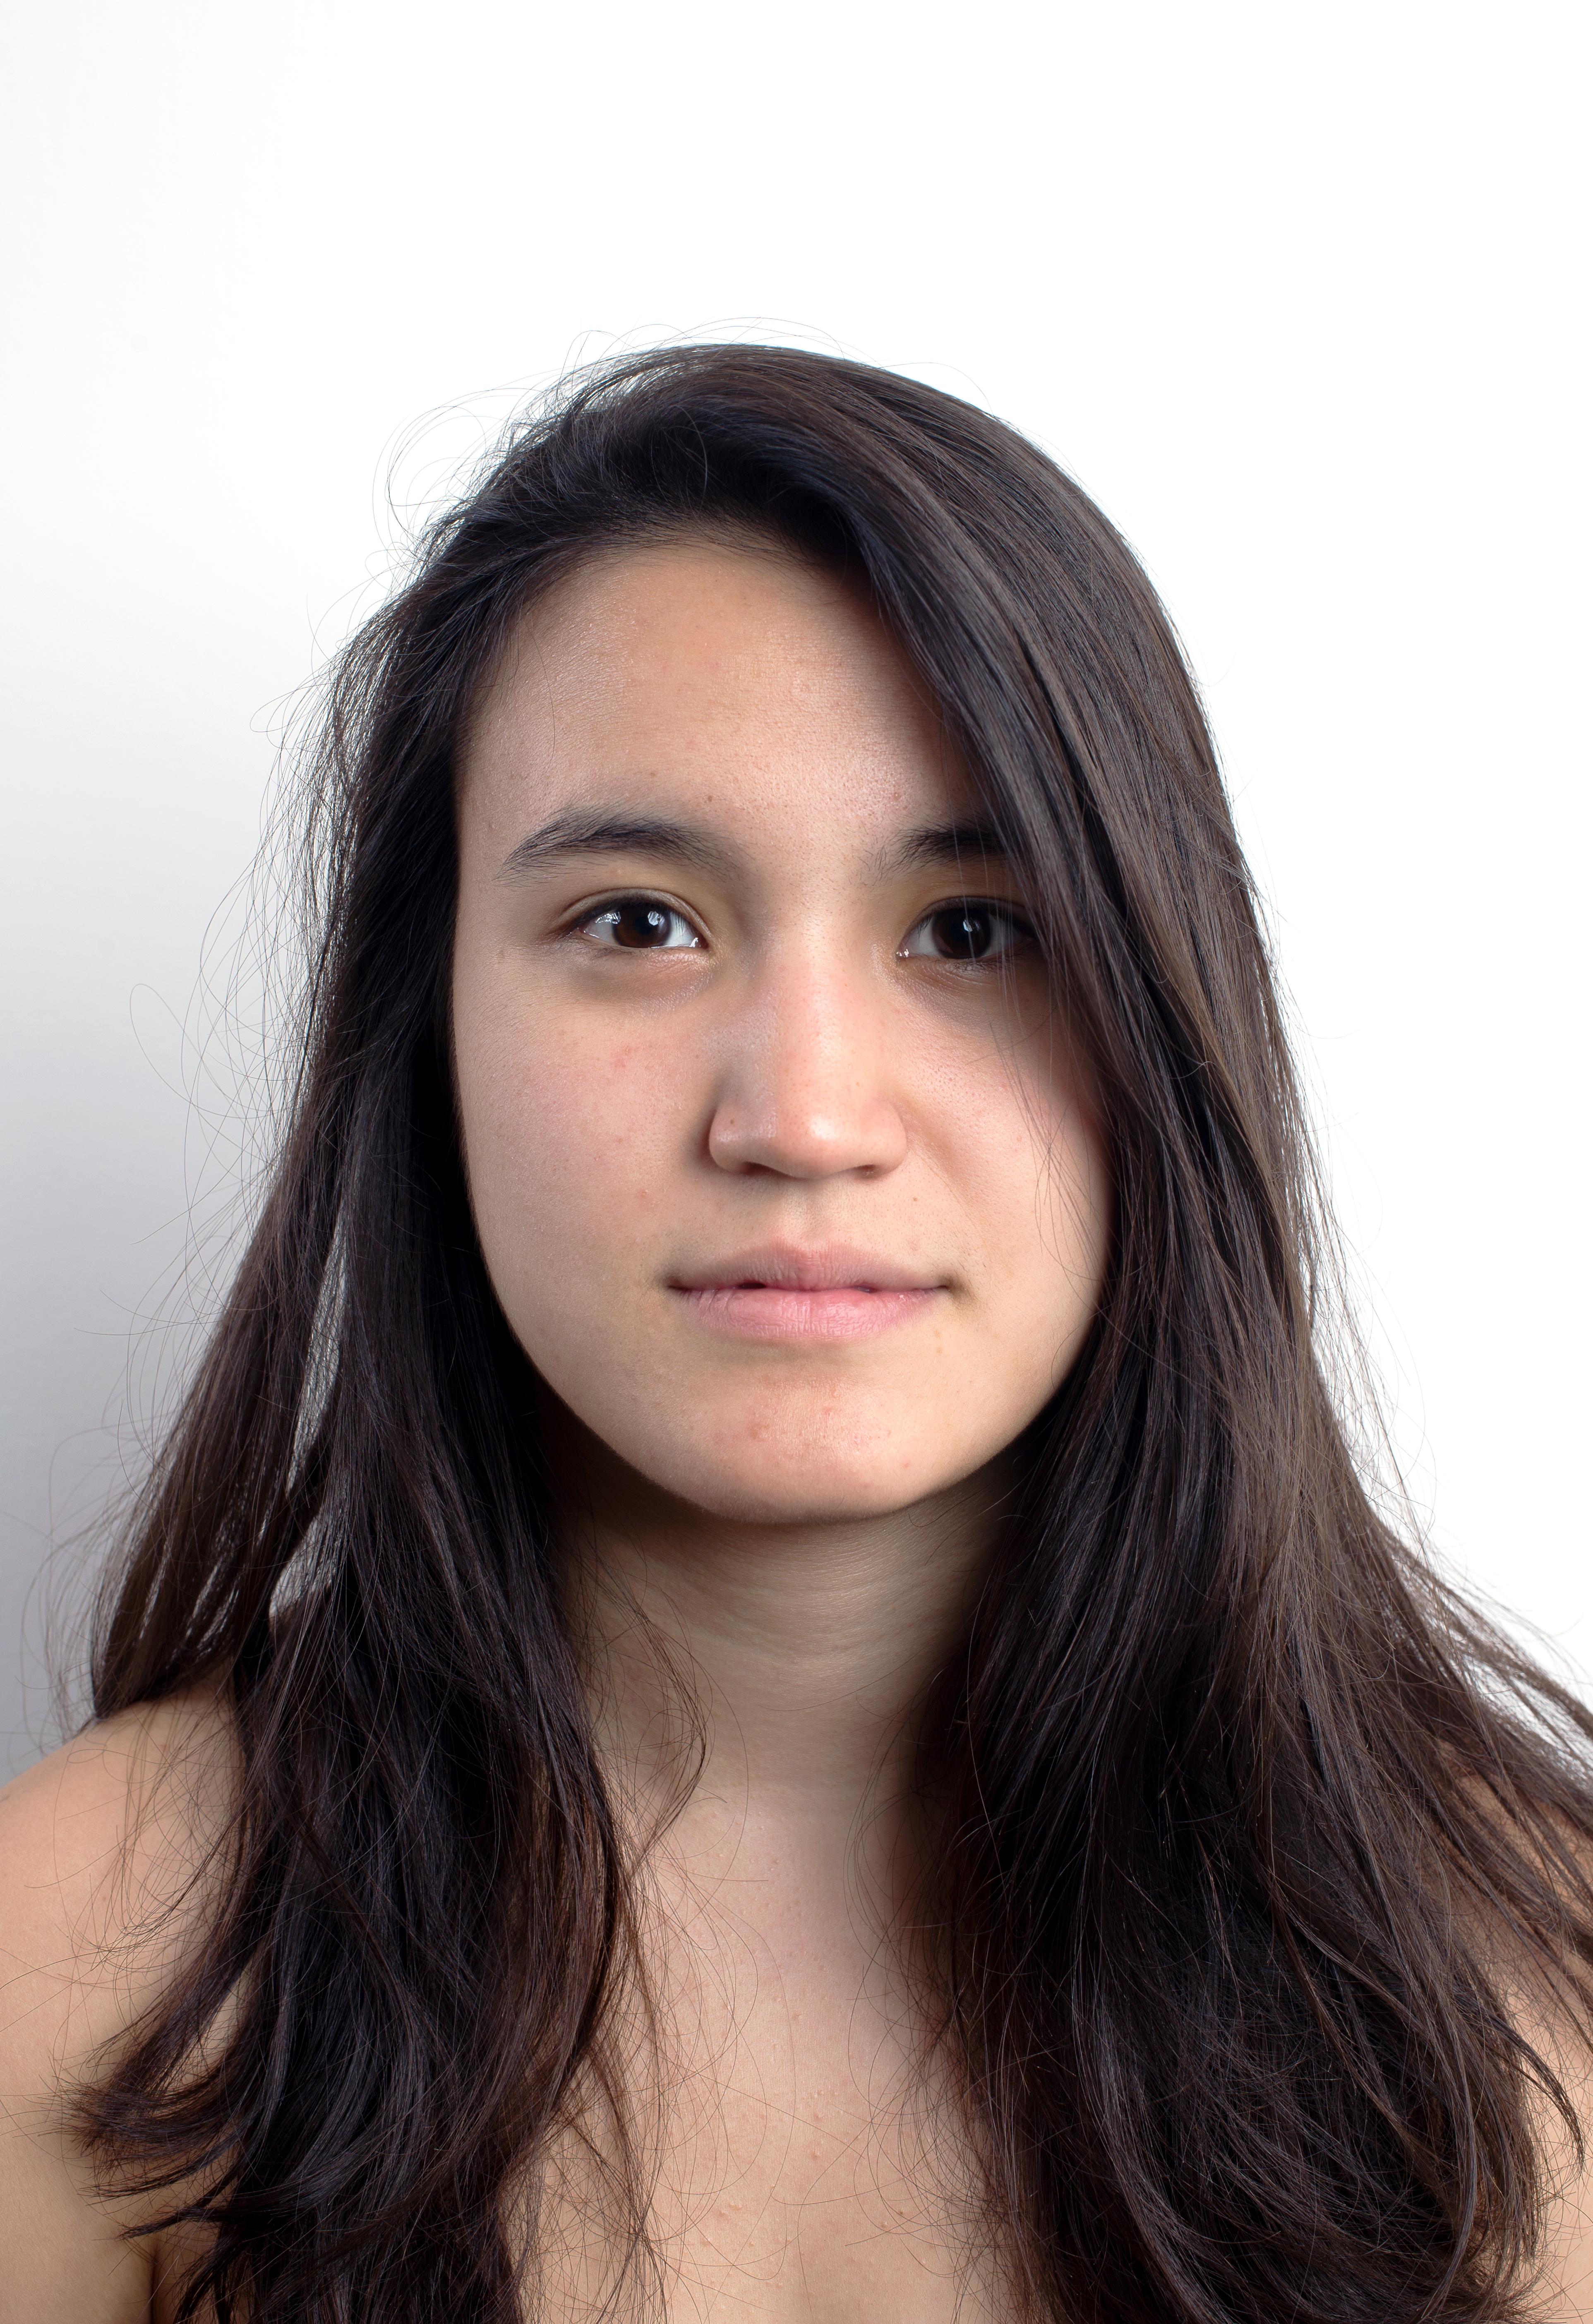 Olivia Marie Angiuli